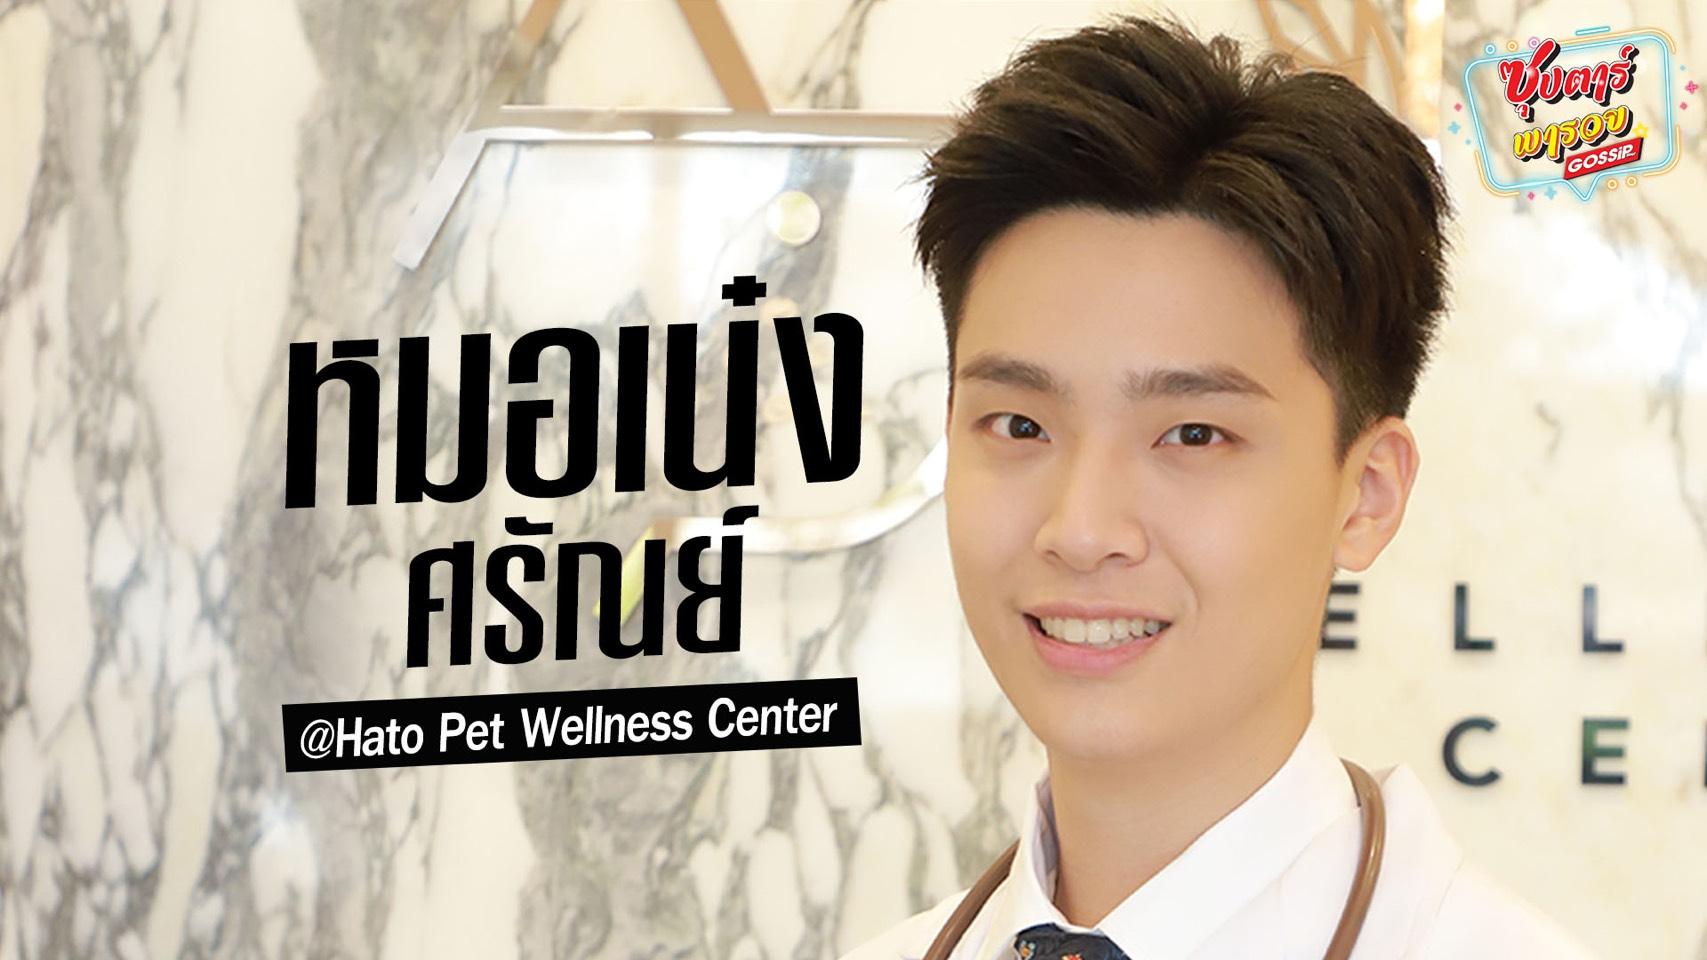 Hato Pet Wellness Center ธุรกิจดารา ร้านดารา สัตวแพทย์ หมอเน๋ง ศรัณย์ เน๋ง ศรัณย์ นราประเสริฐกุล